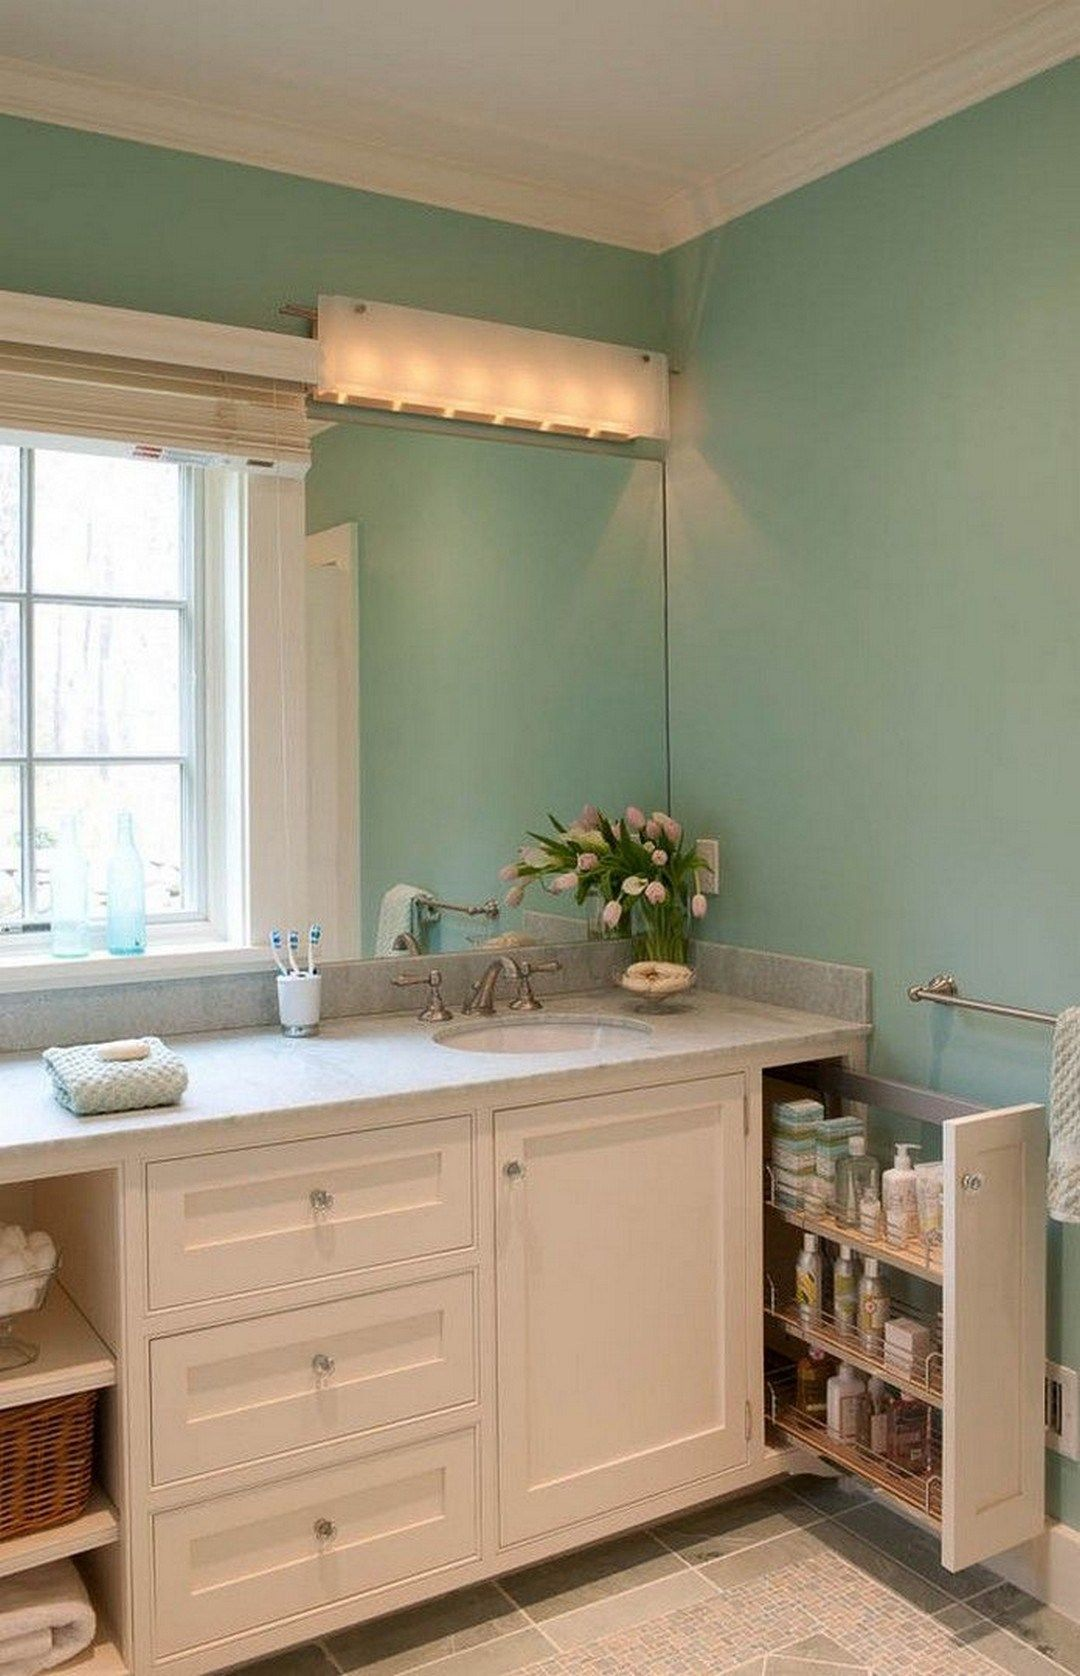 Hugedomains Com Bathroom Vanity Storage Bathroom Vanity Top Bathroom Design [ 1676 x 1080 Pixel ]